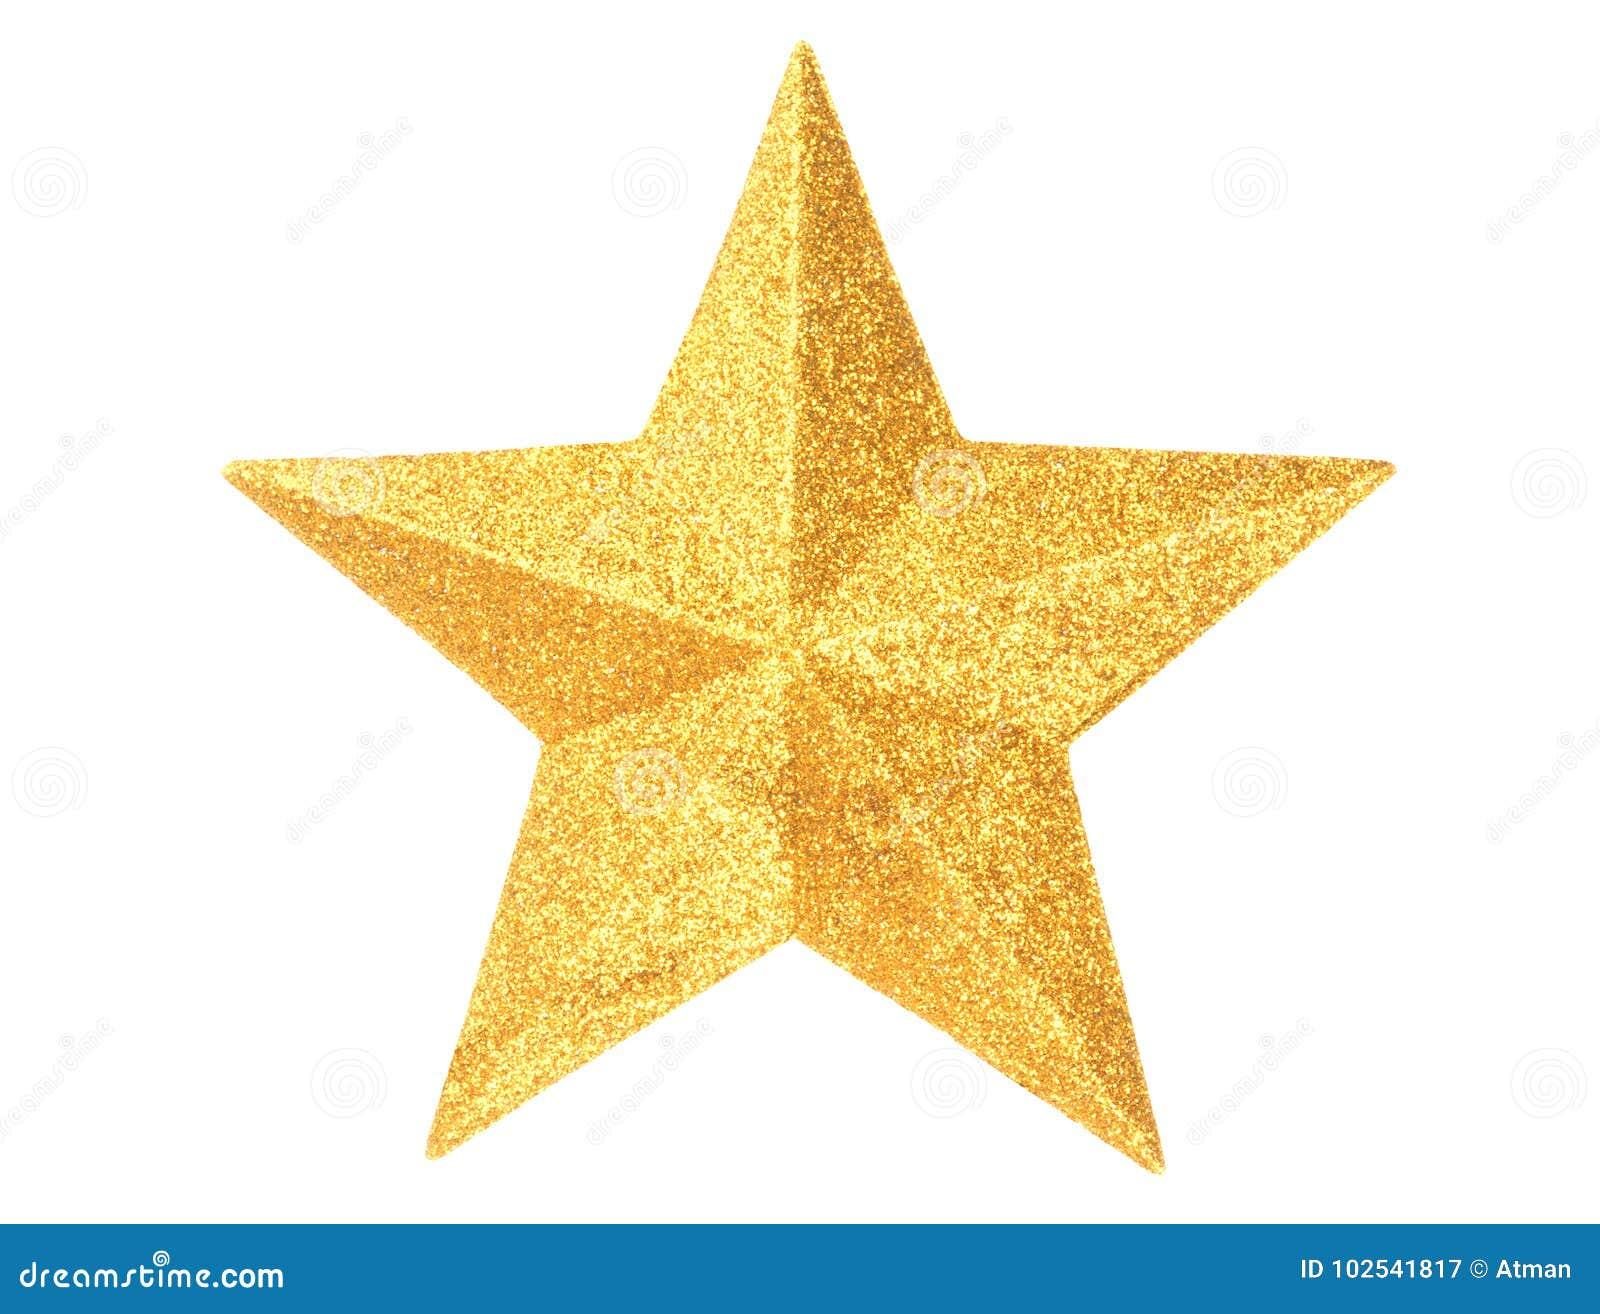 gold christmas star on white stock image image of xmas star